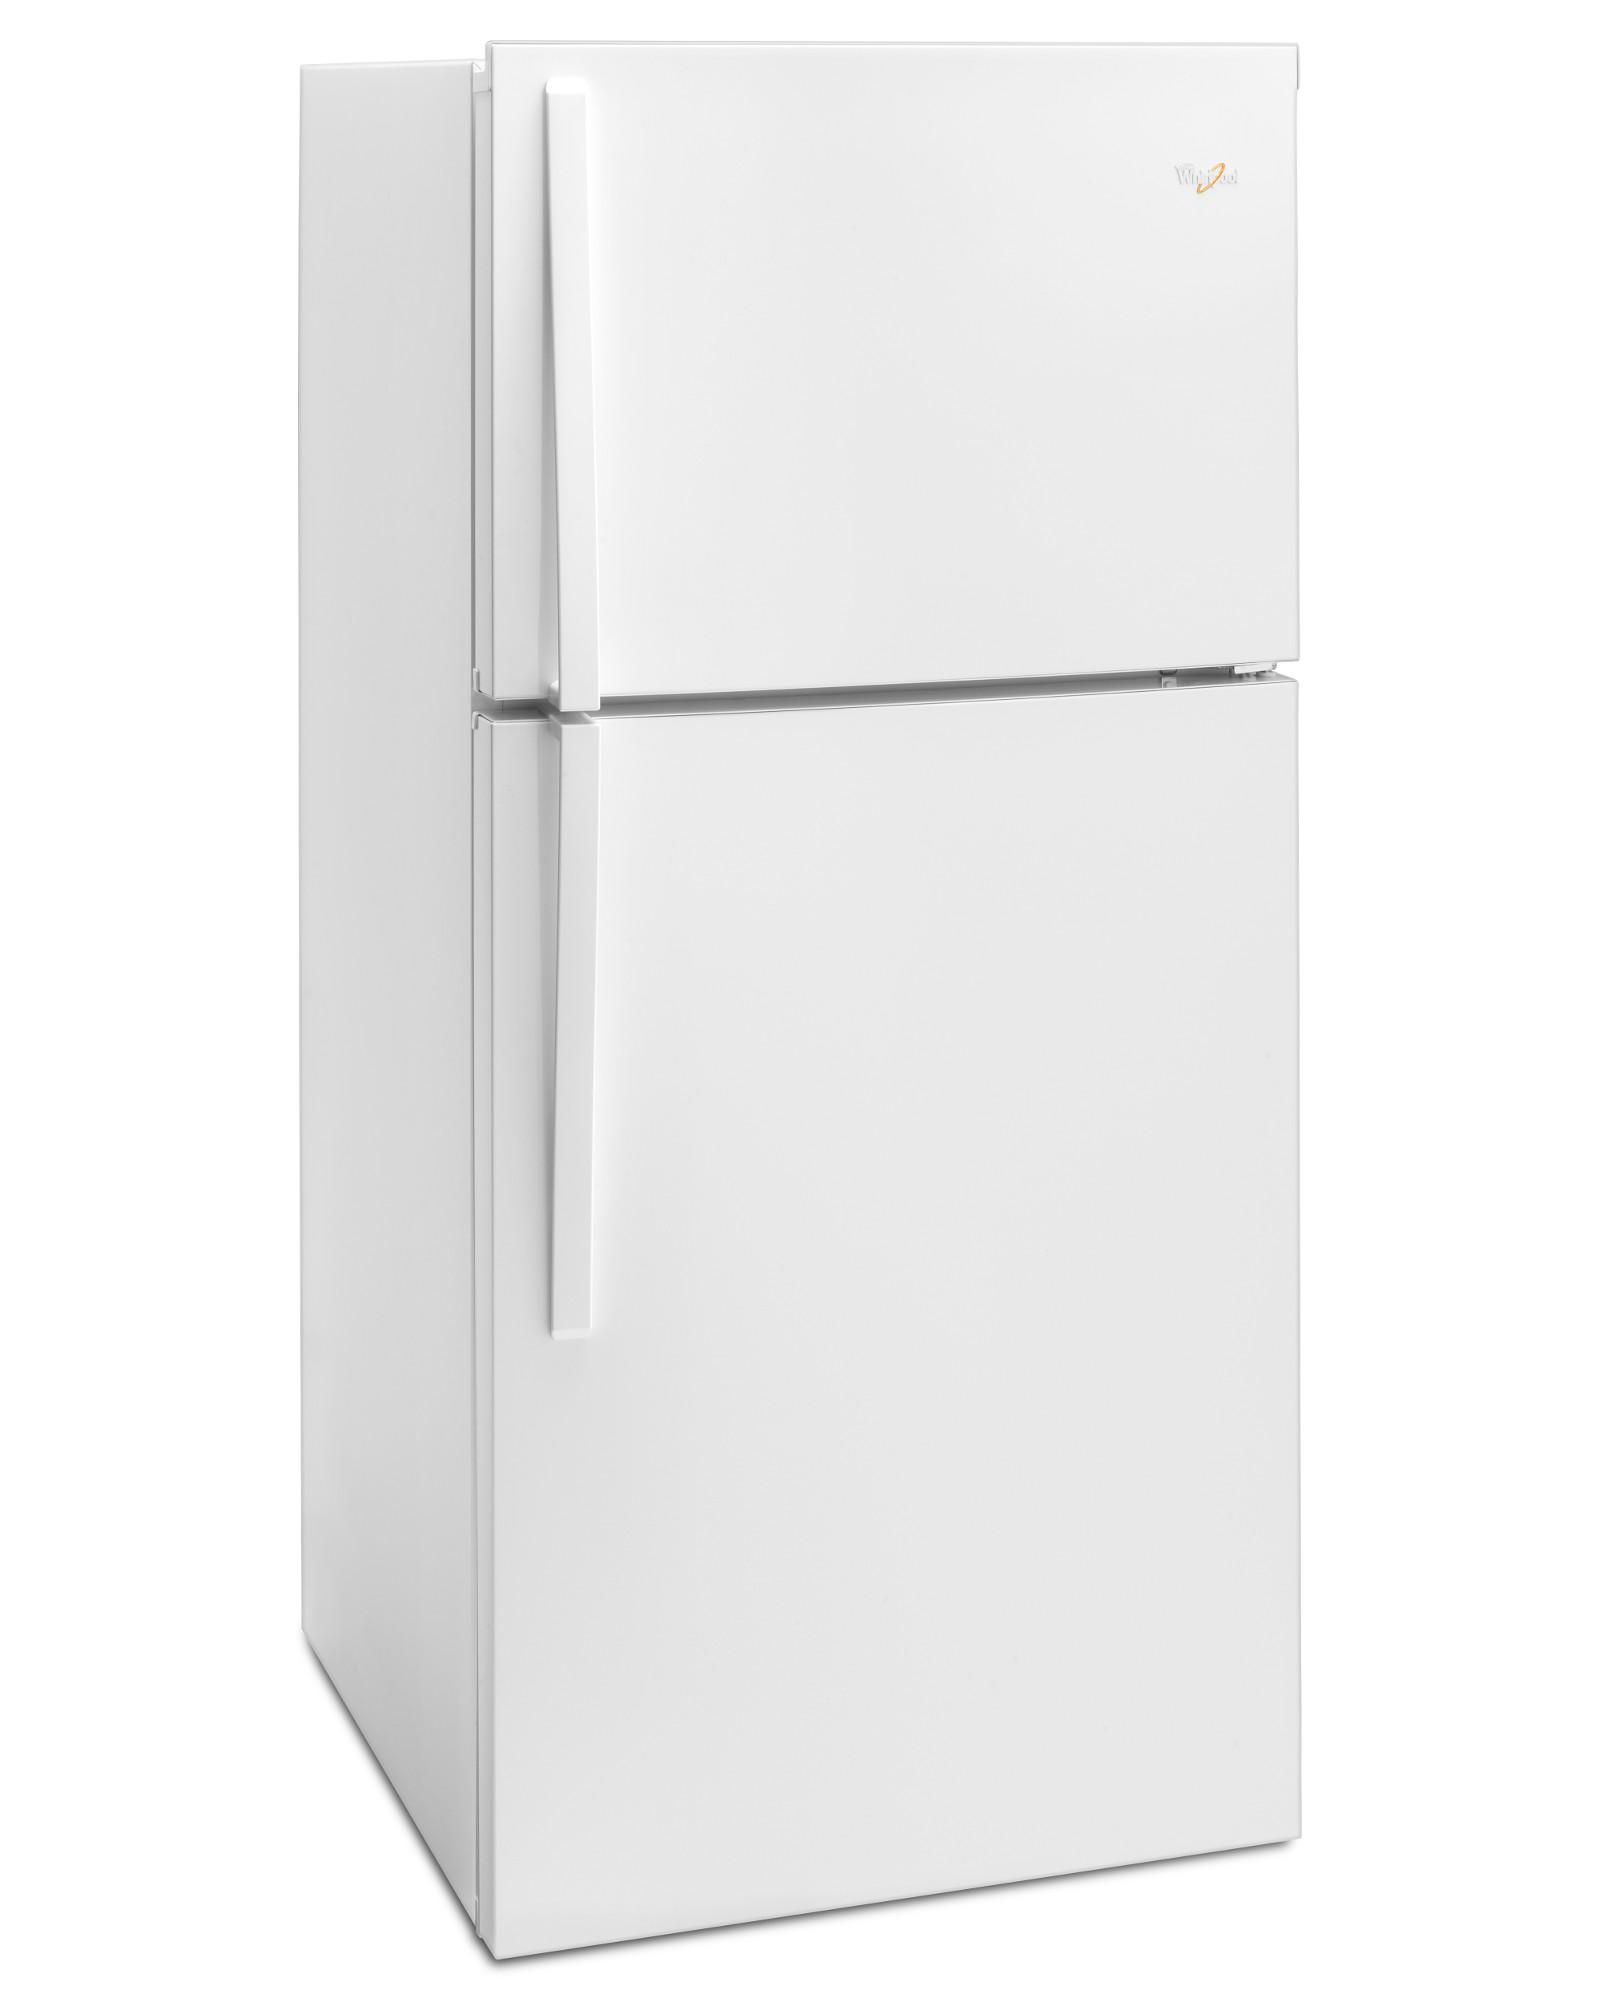 Whirlpool WRT519SZDW 19 cu. ft. Top Freezer Refrigerator w/ LED Interior Lighting - White